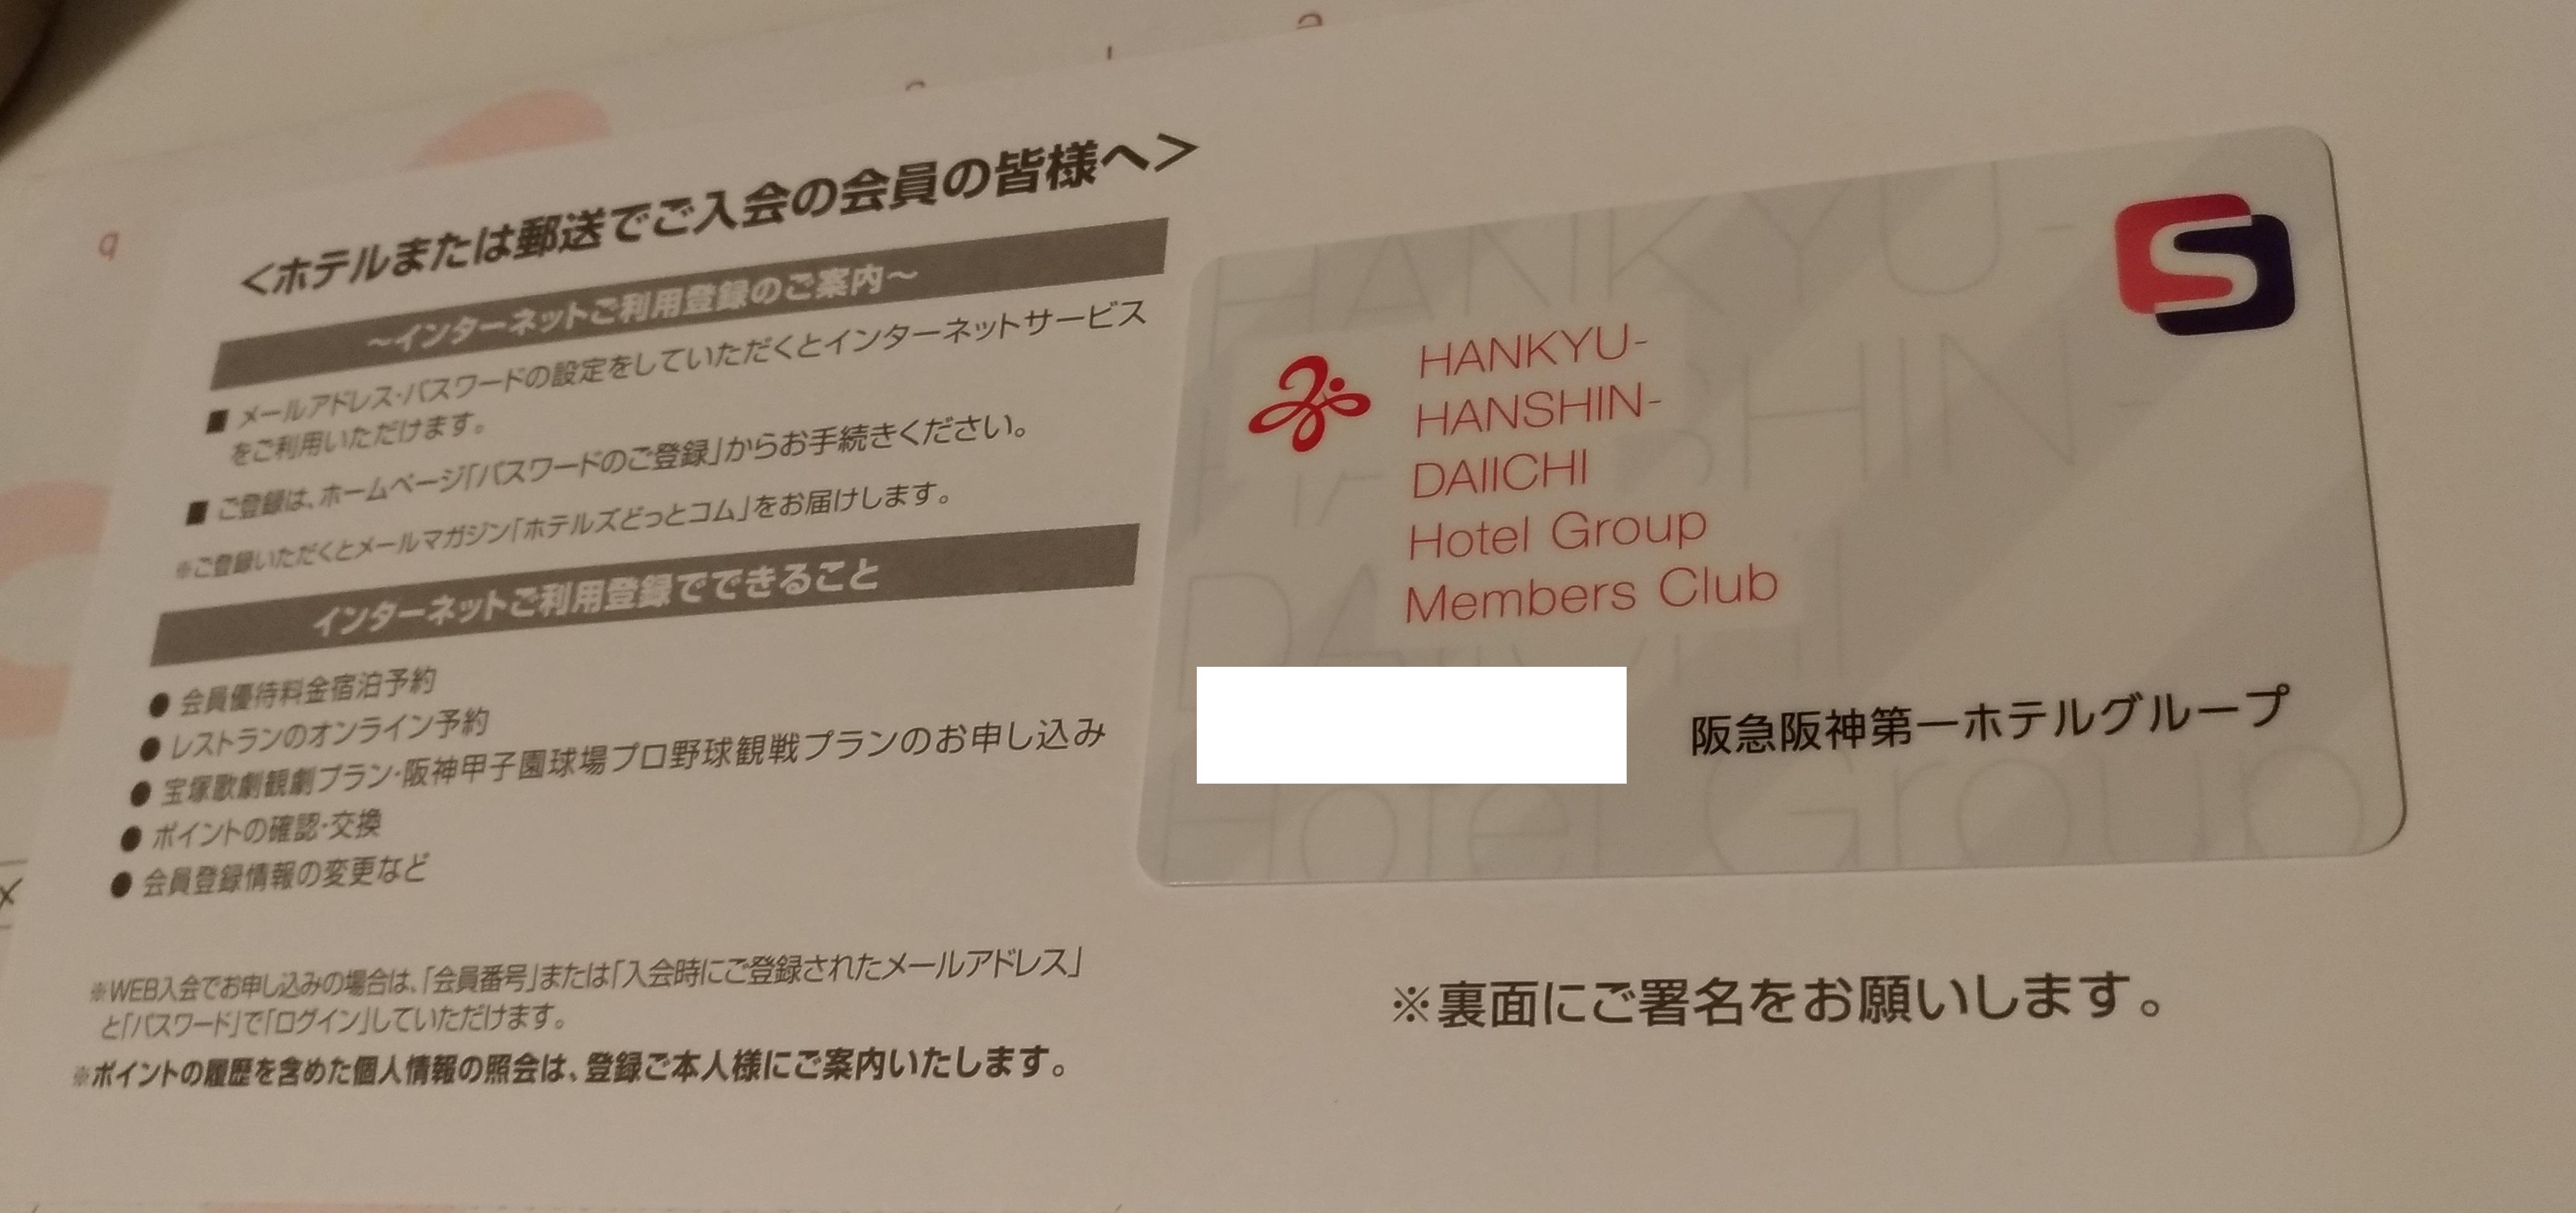 osaka_hotel_hankyu_hanshin.jpg